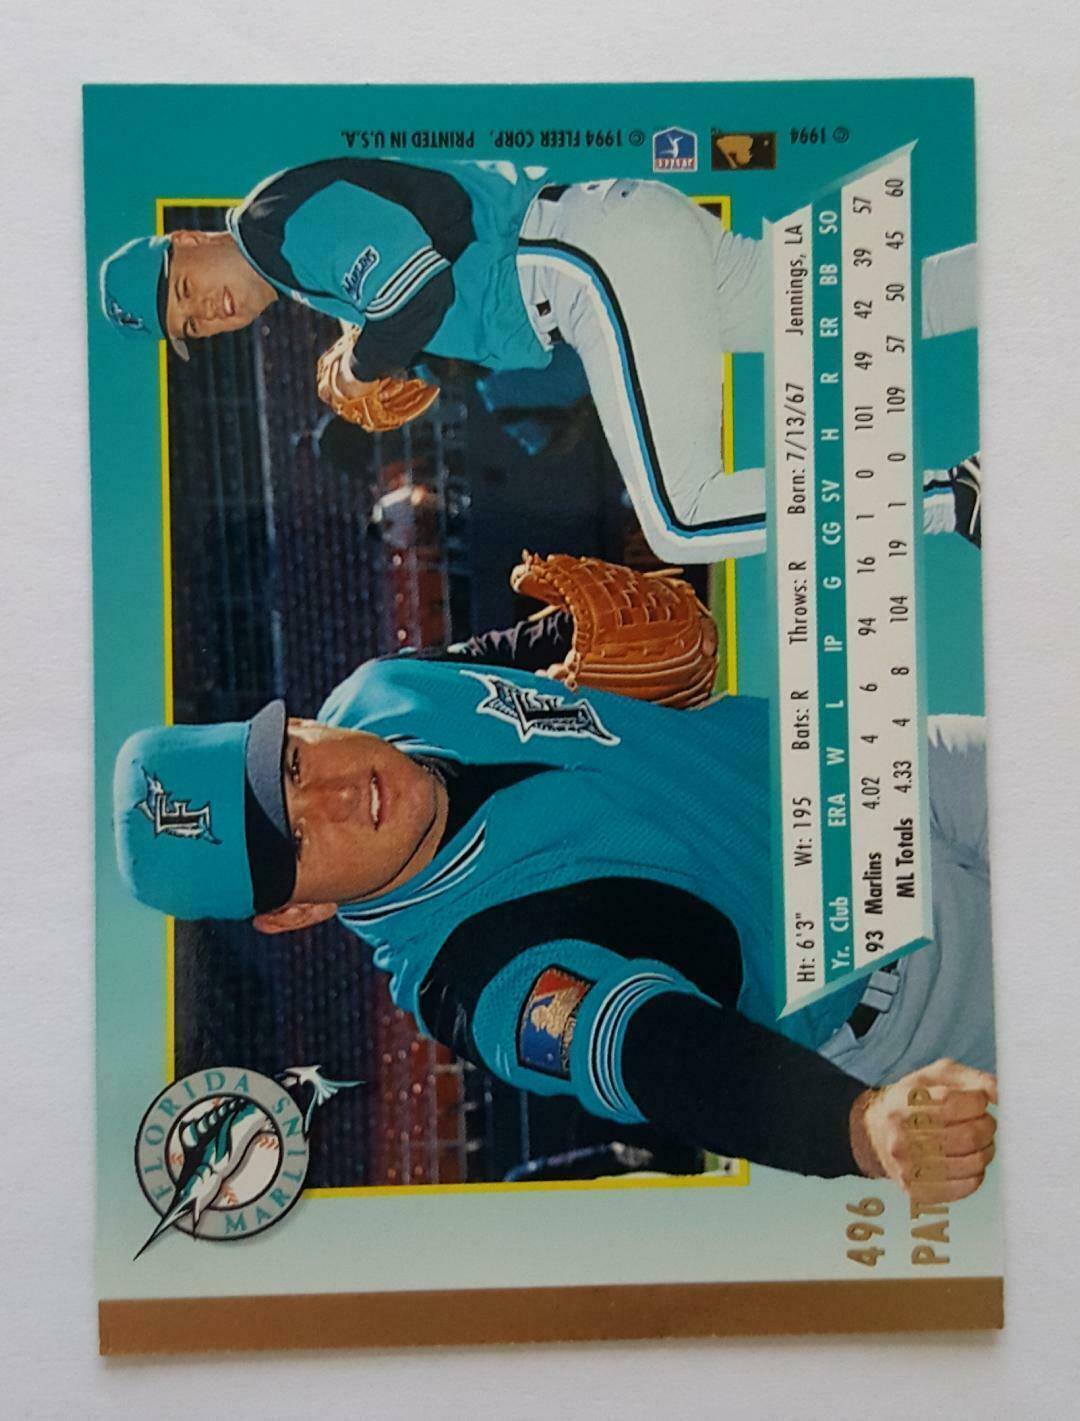 1994 Fleer Ultra + Rookie Card Lot NM Cond w/ Pat Ripp, Clint Davis, Nice Cards image 7